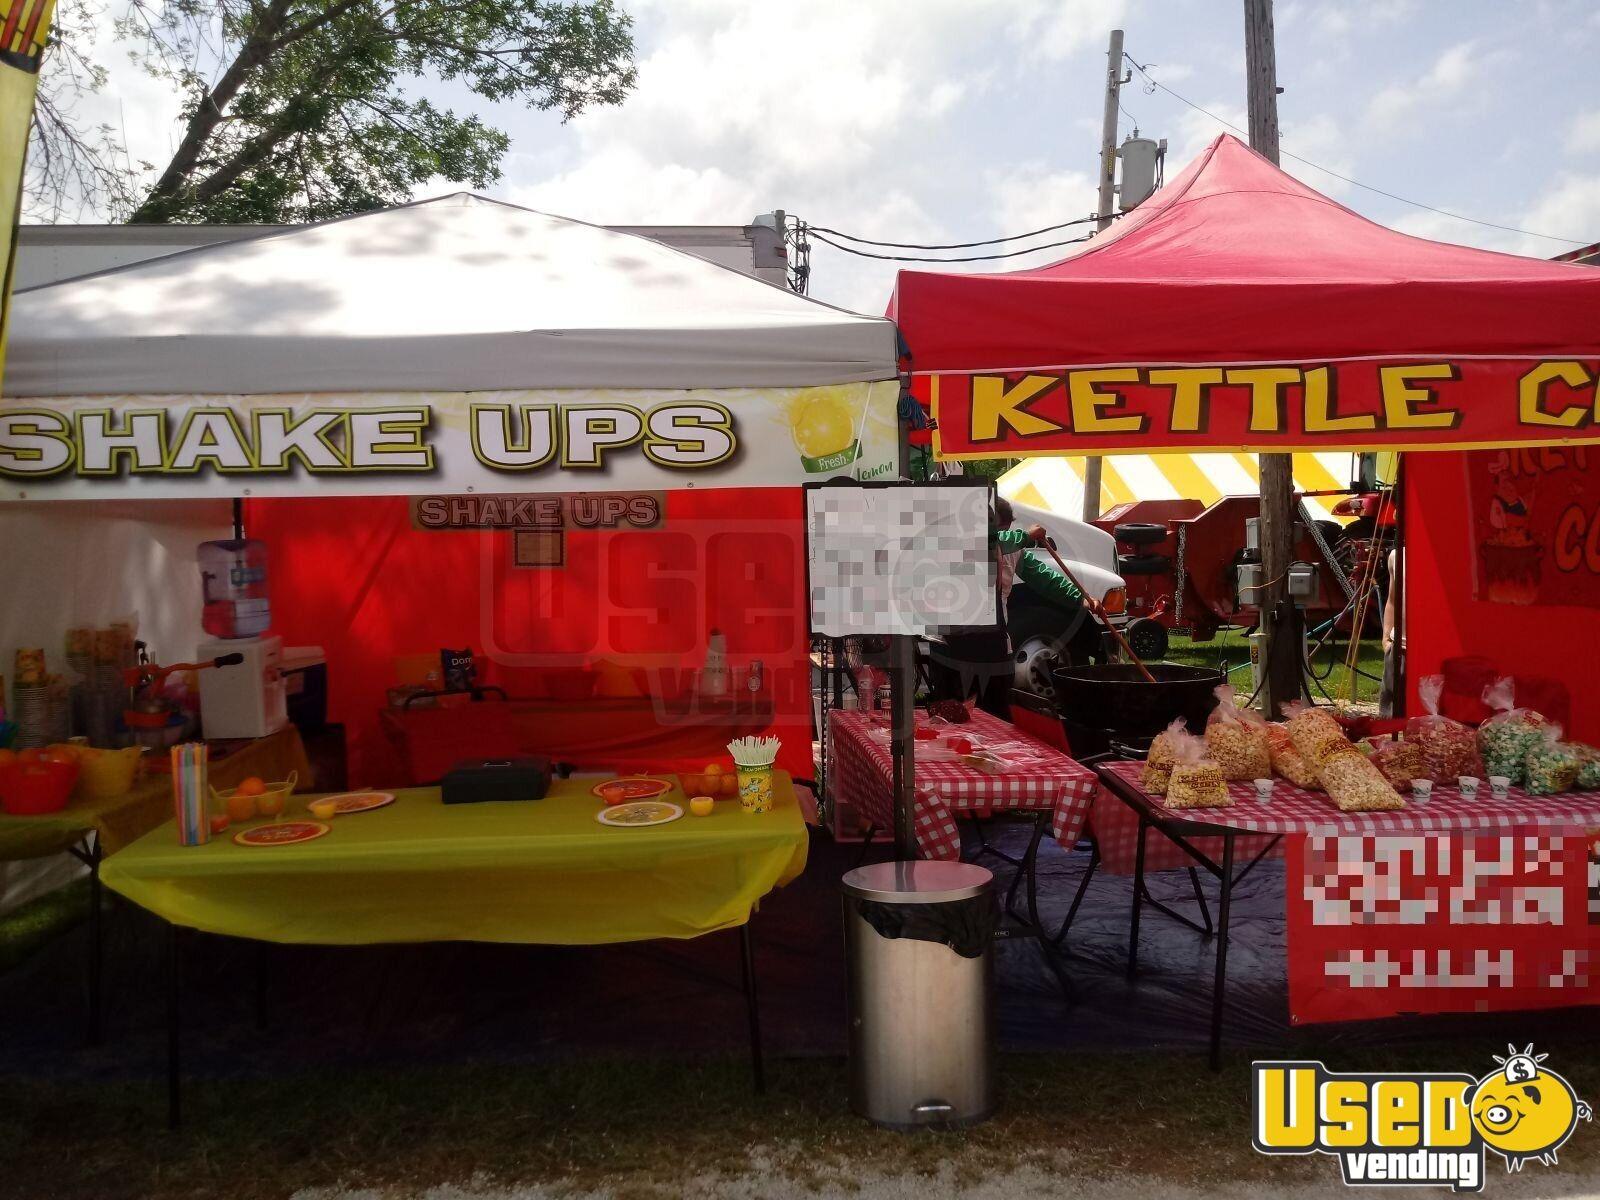 10u0027 x 20u0027 Kettle Corn u0026 Shakeup Concession Stands / Tents for Sale in Illinois! & 10u0027 x 20u0027 Kettle Corn u0026 Shakeup Stands | Concession Stands / Tents ...